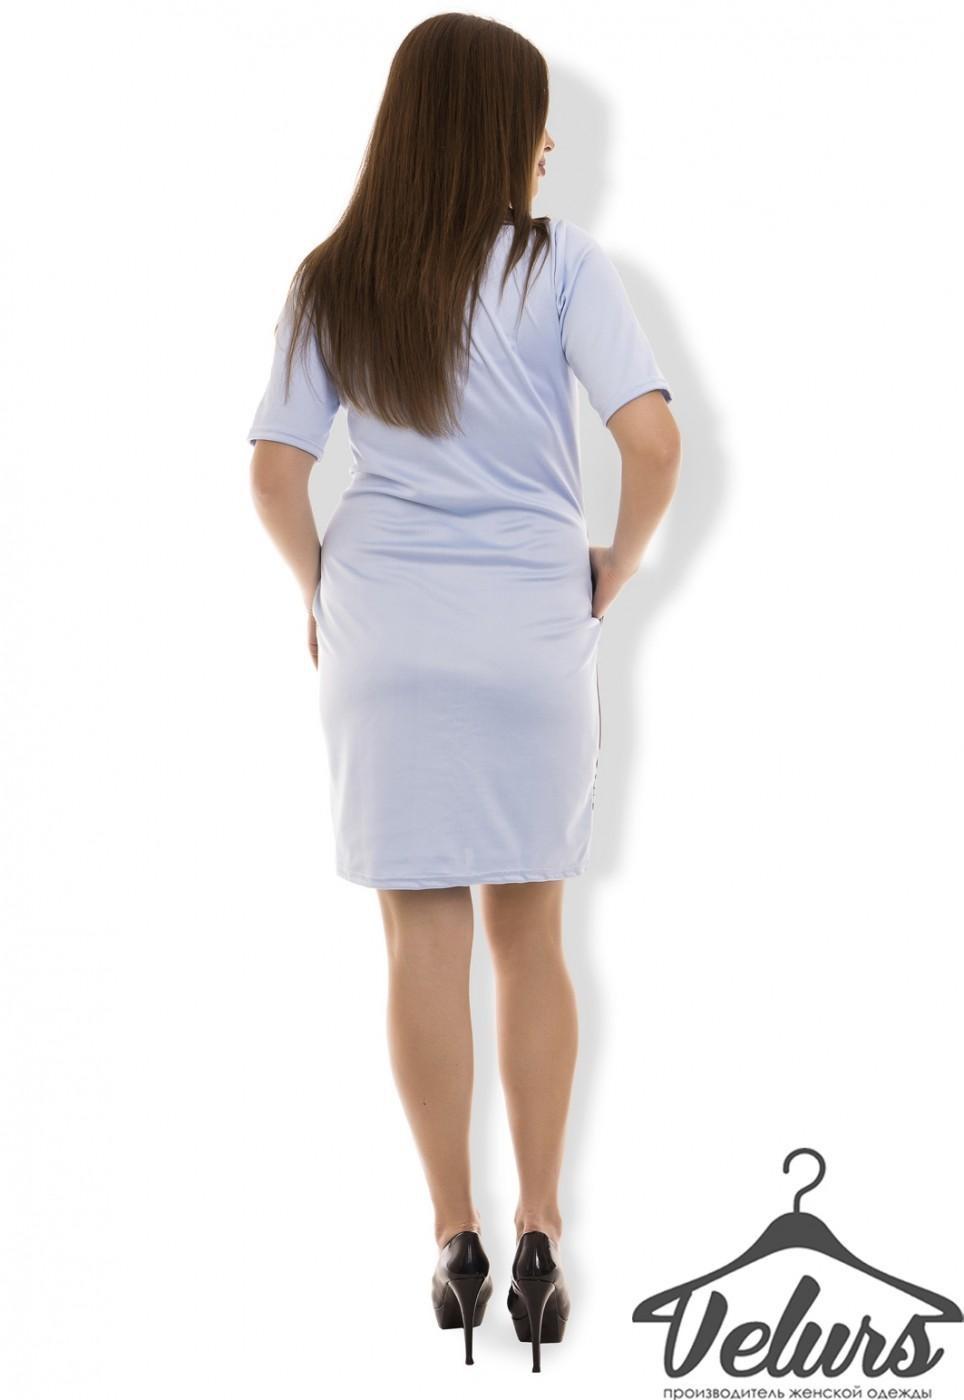 Velurs: Платье 212110 - фото 24